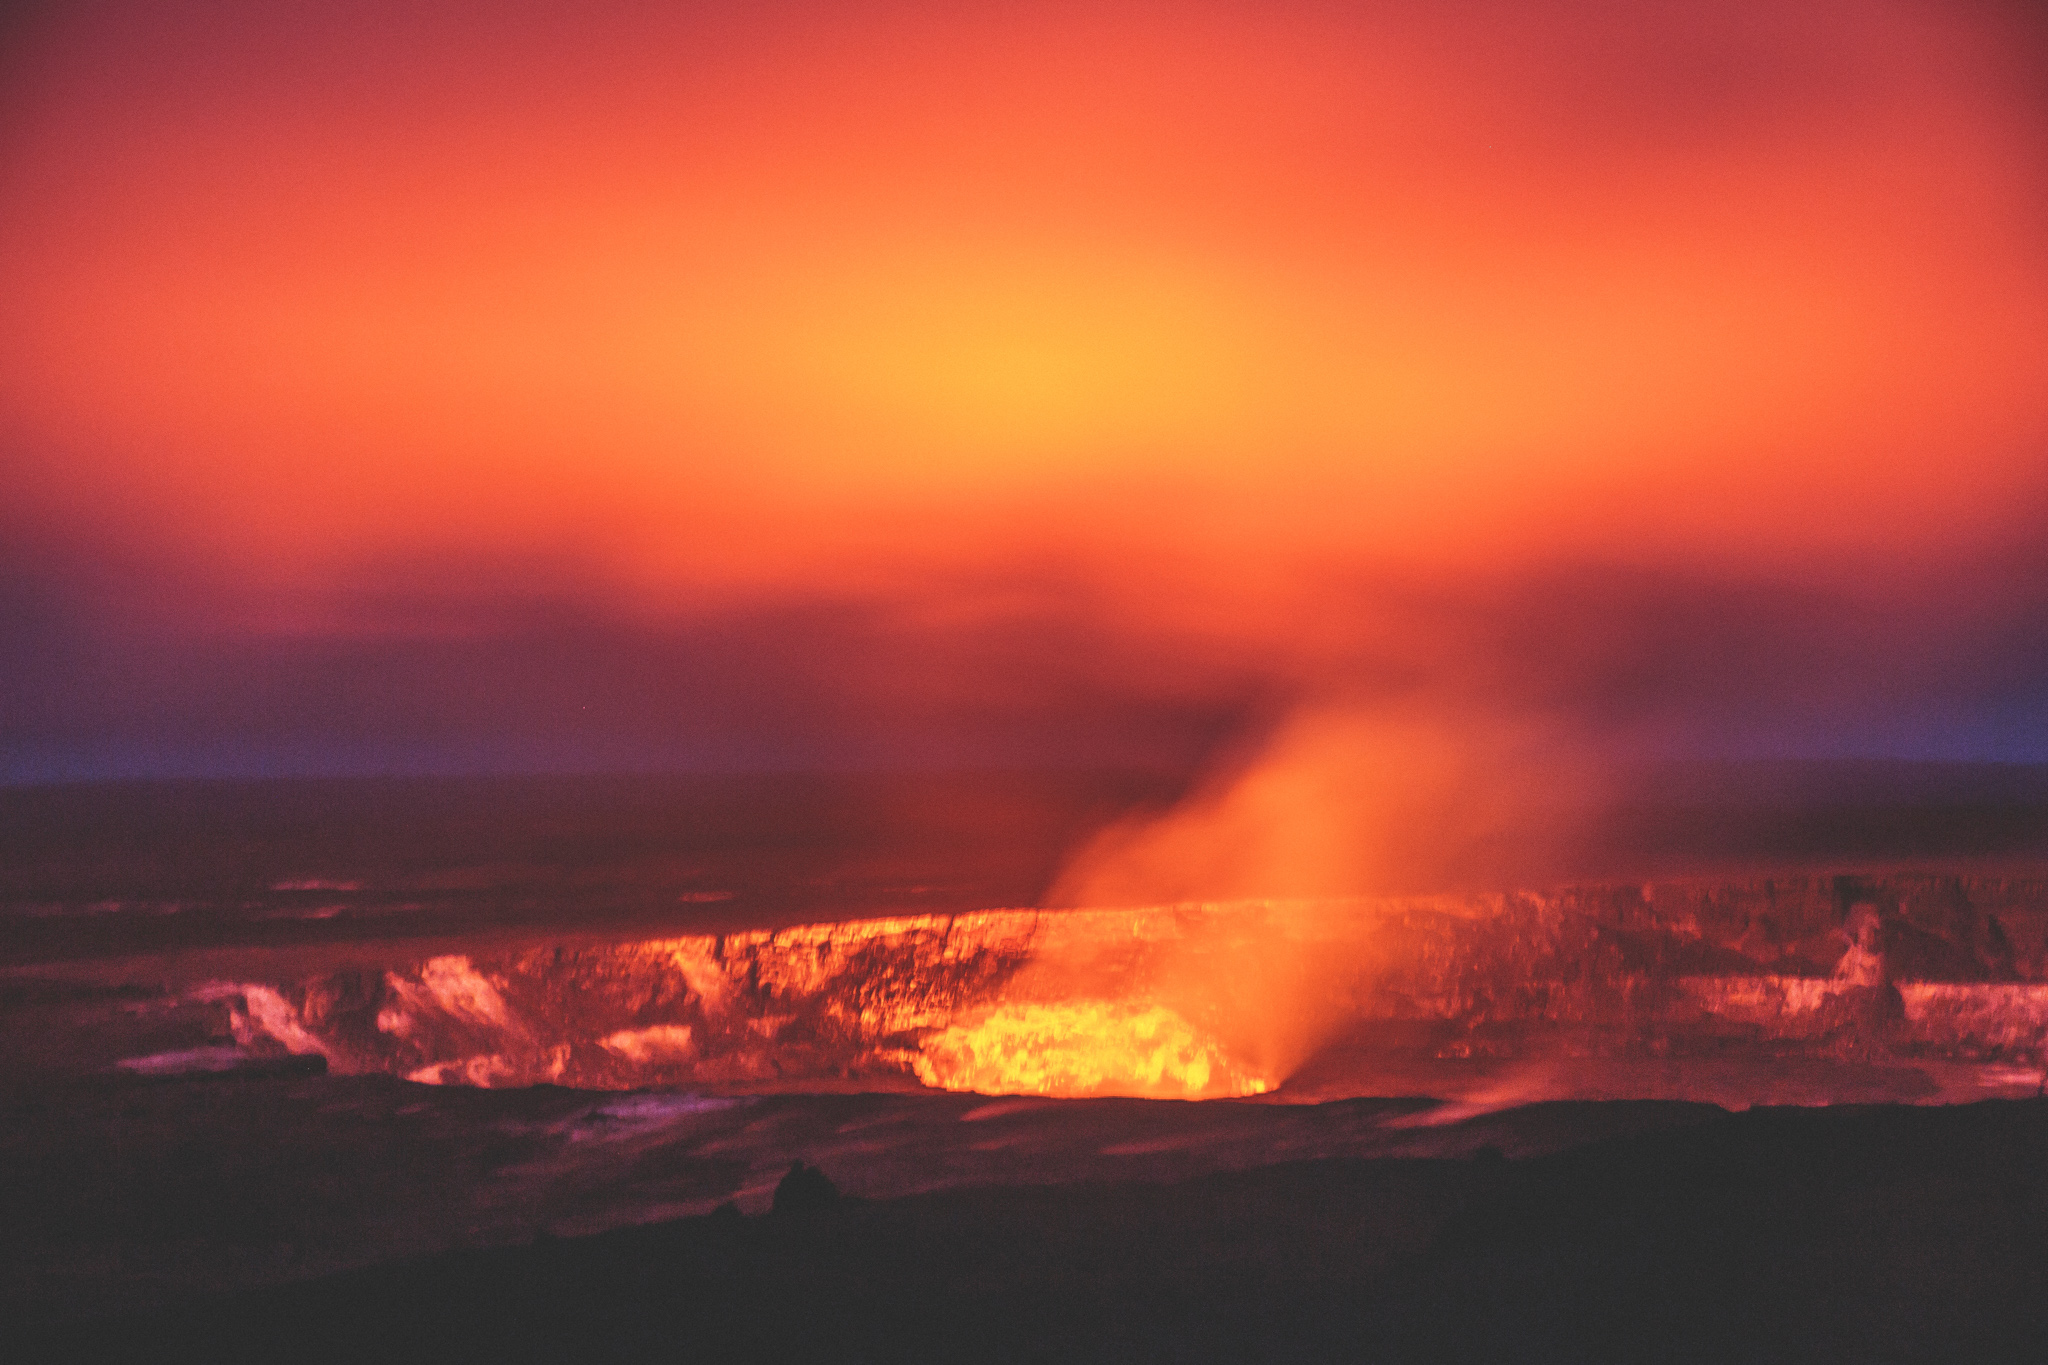 Hawaii Volcano glowing at night // 10 Things You Have to Do on the Big Island of Hawaii // www.readysetjetset.net #readysetjetset #hawaii #bigisland #blogpost #hawaiiguide